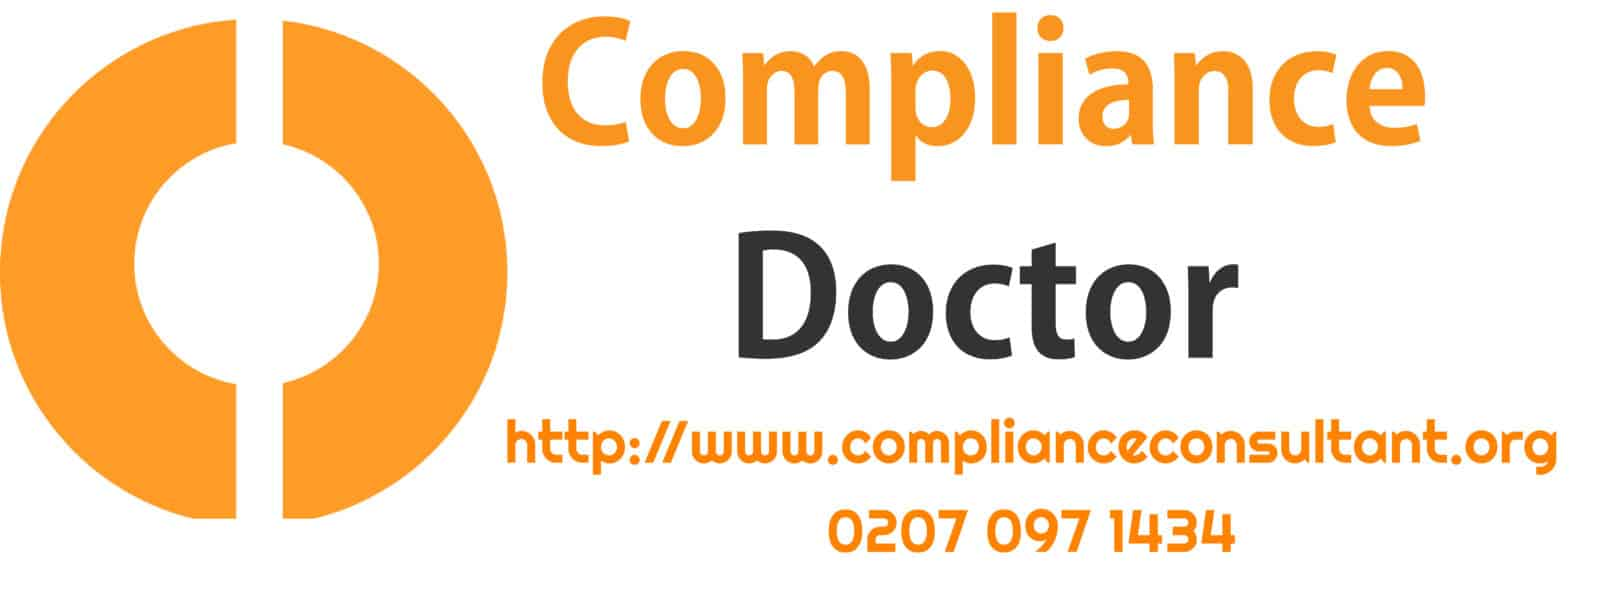 compliance consultants London